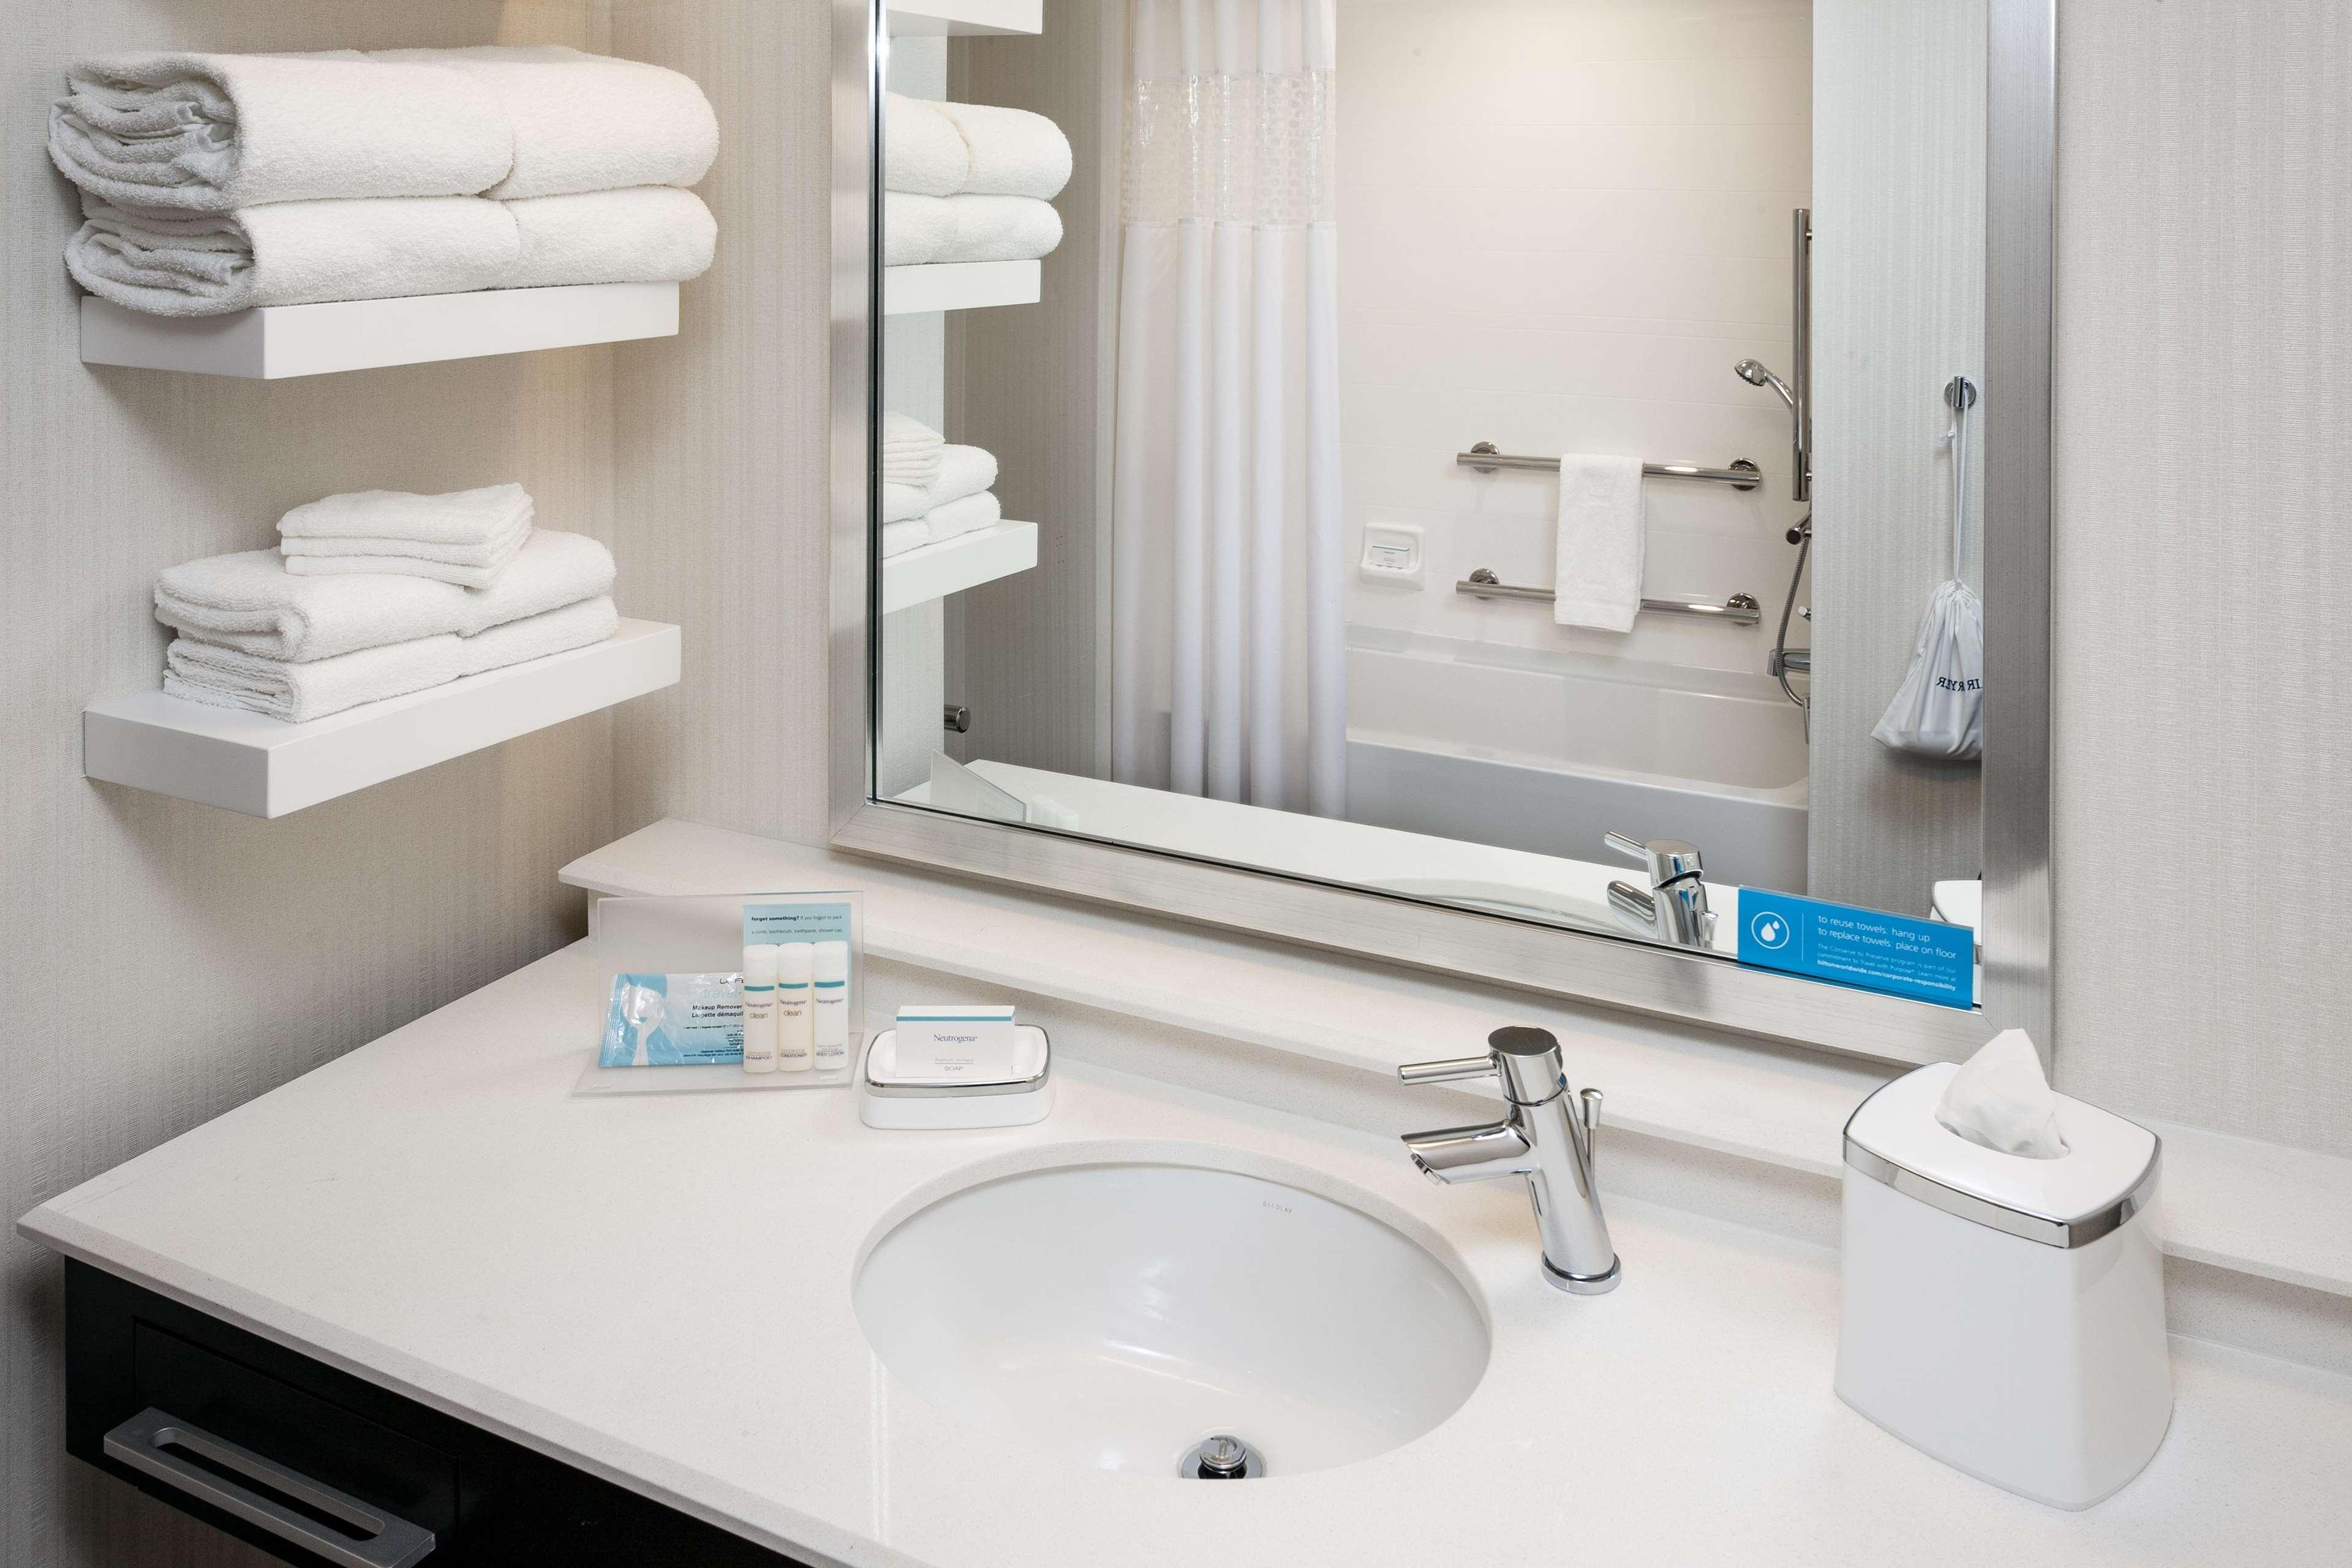 Hampton Inn & Suites by Hilton Seattle/Northgate image 7